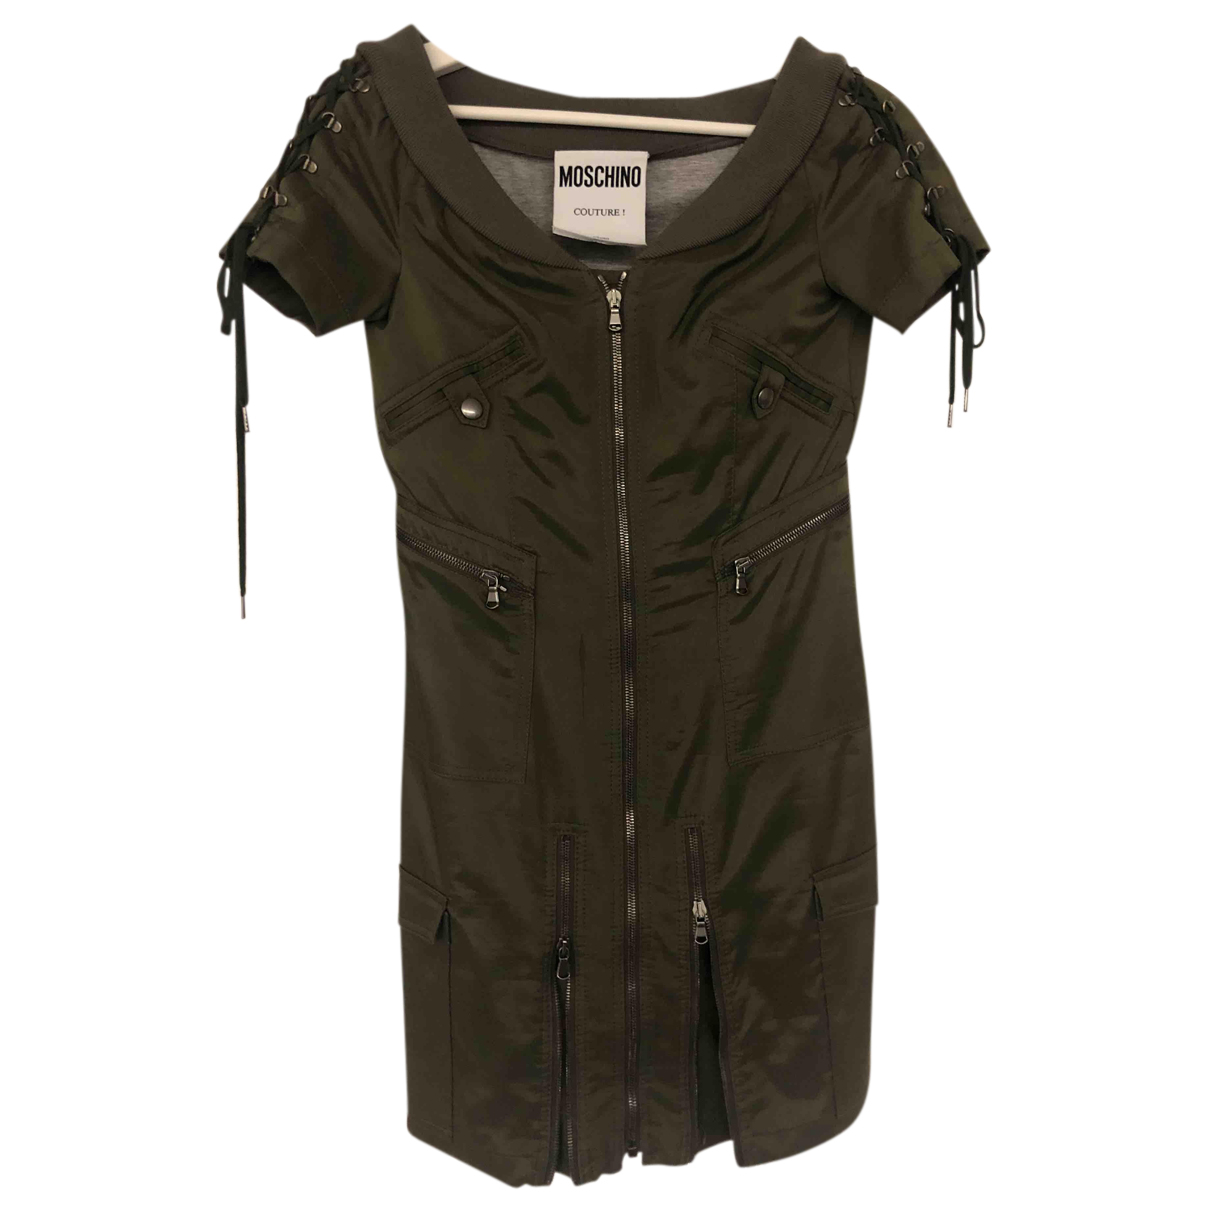 Moschino N Khaki dress for Women M International